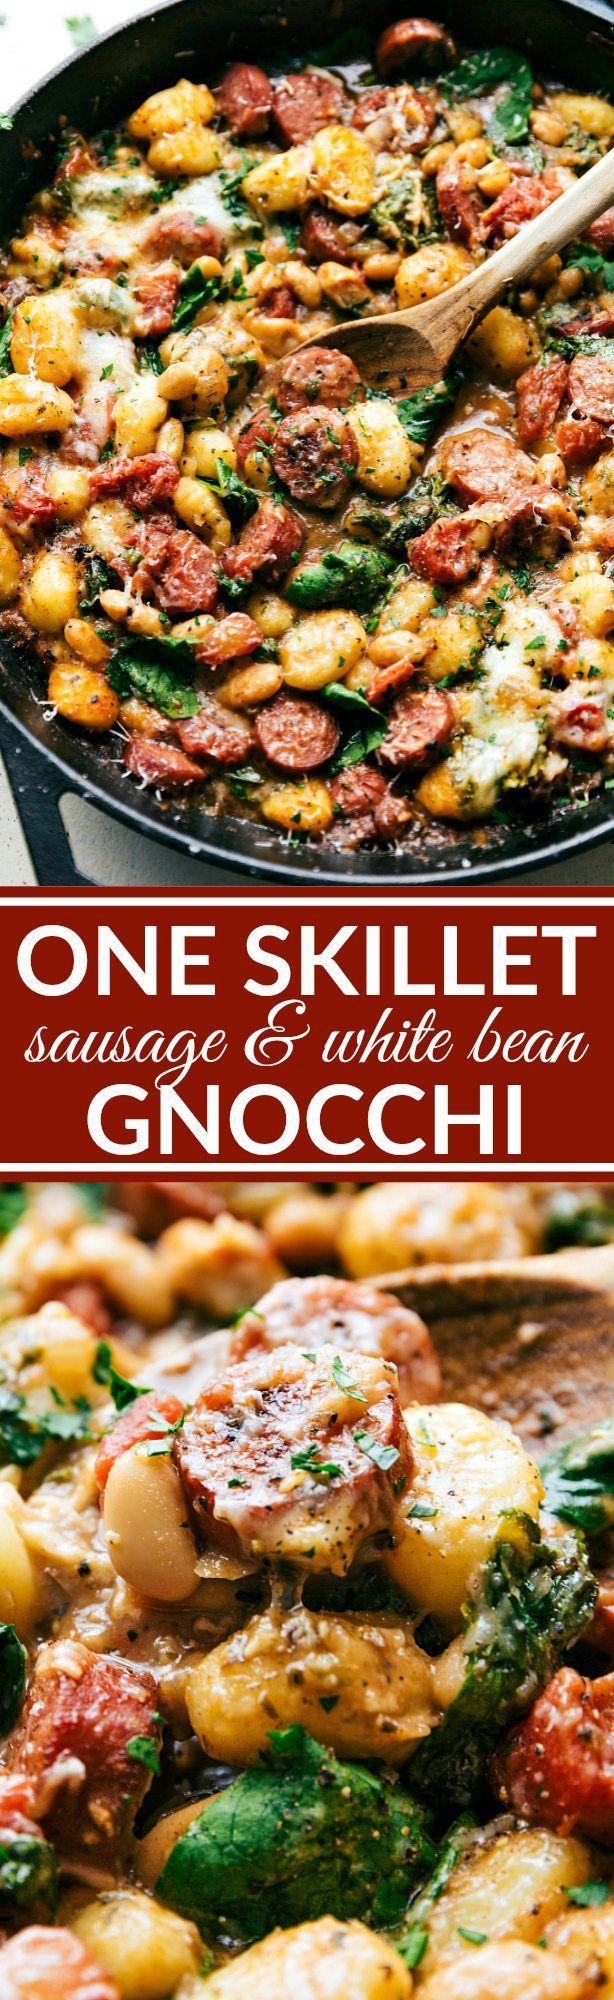 One Skillet Sausage & White Bean Gnocchi